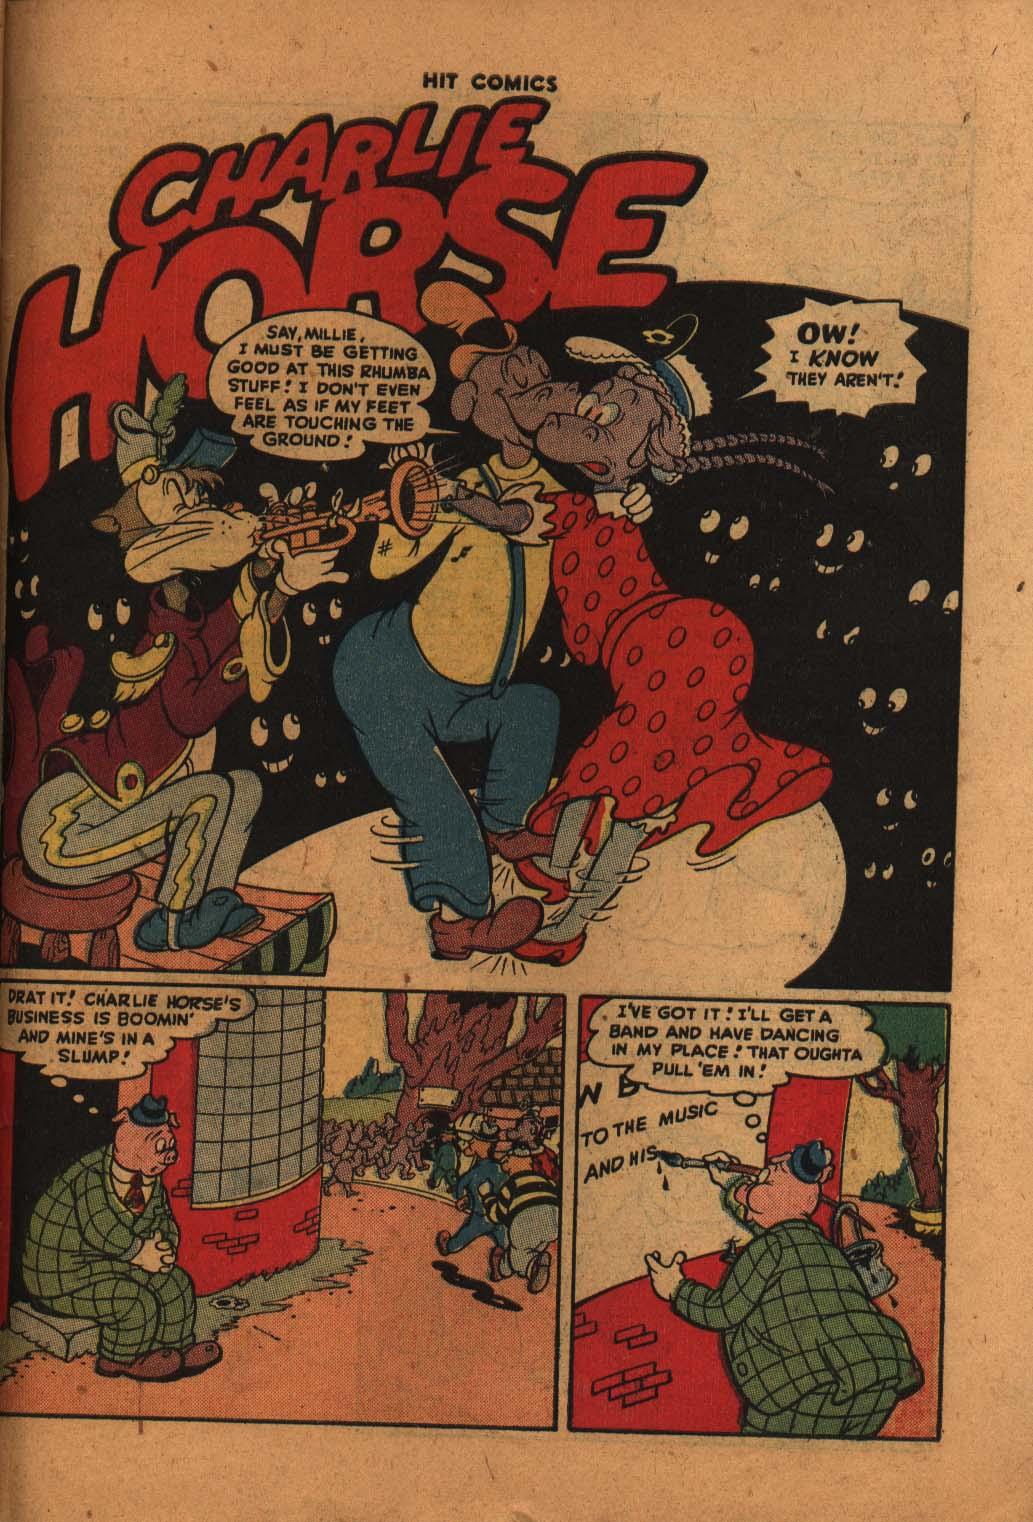 Read online Hit Comics comic -  Issue #47 - 44